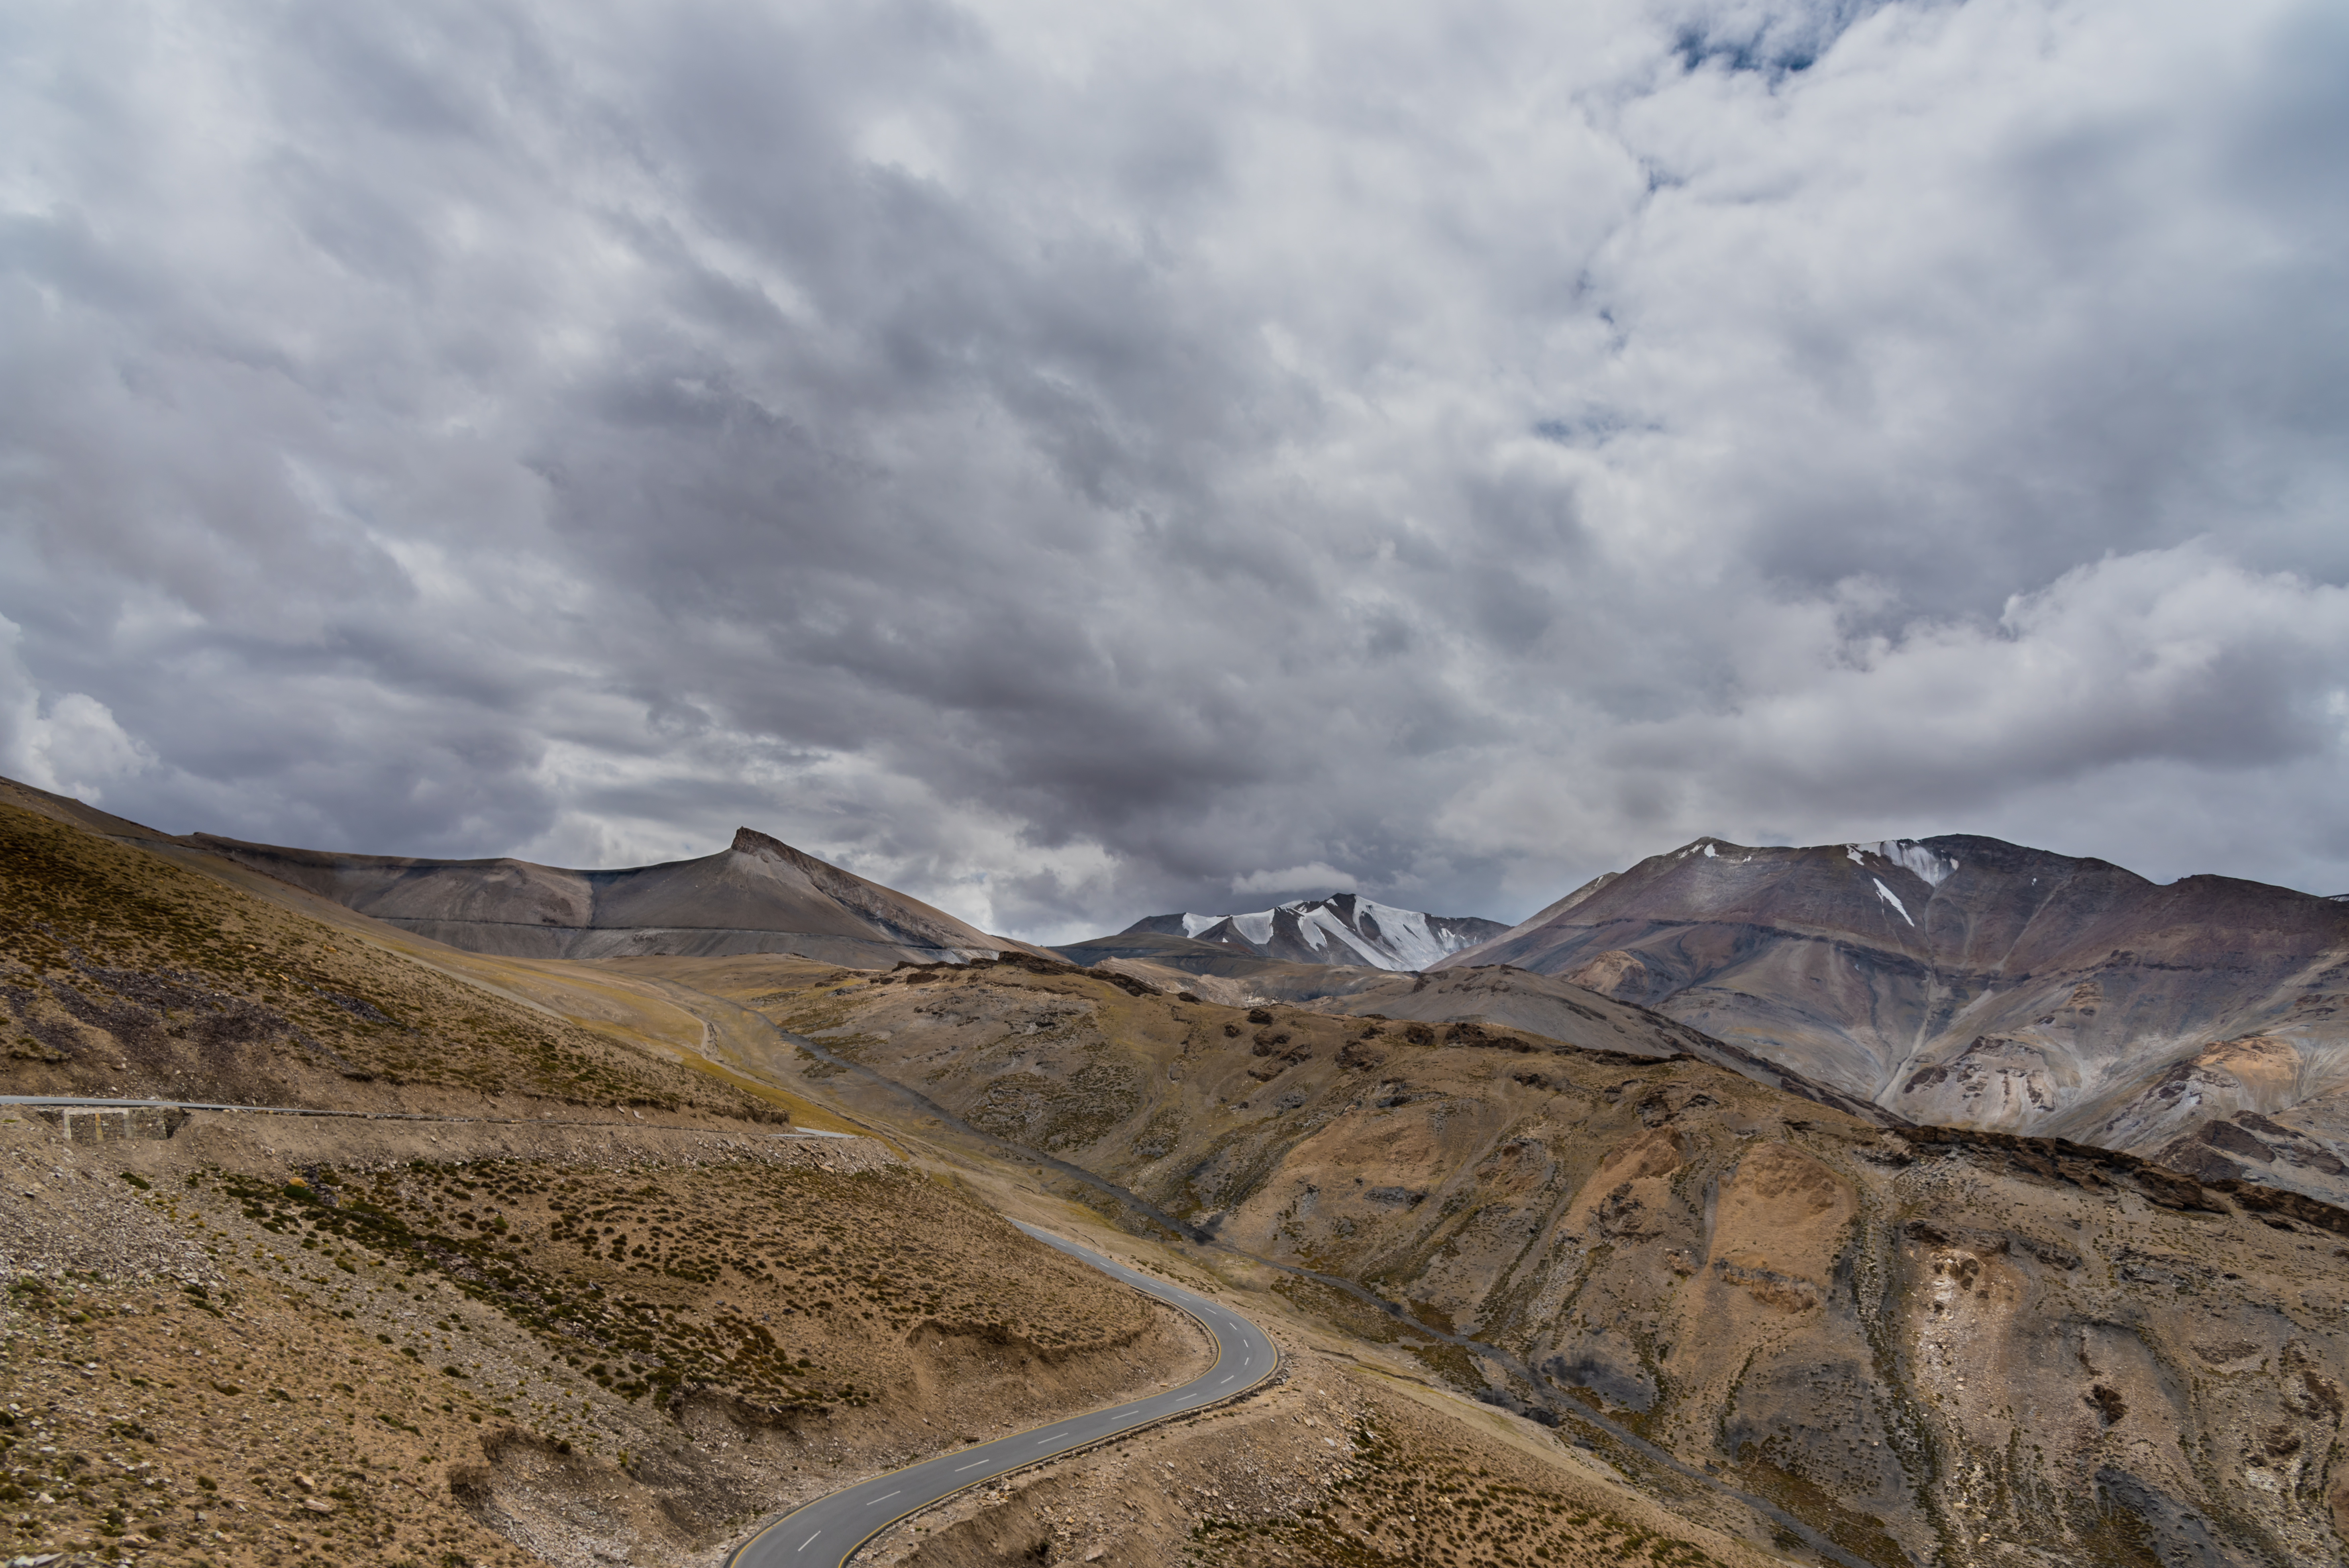 Picturesque Hillscapes Of Ladakh Region